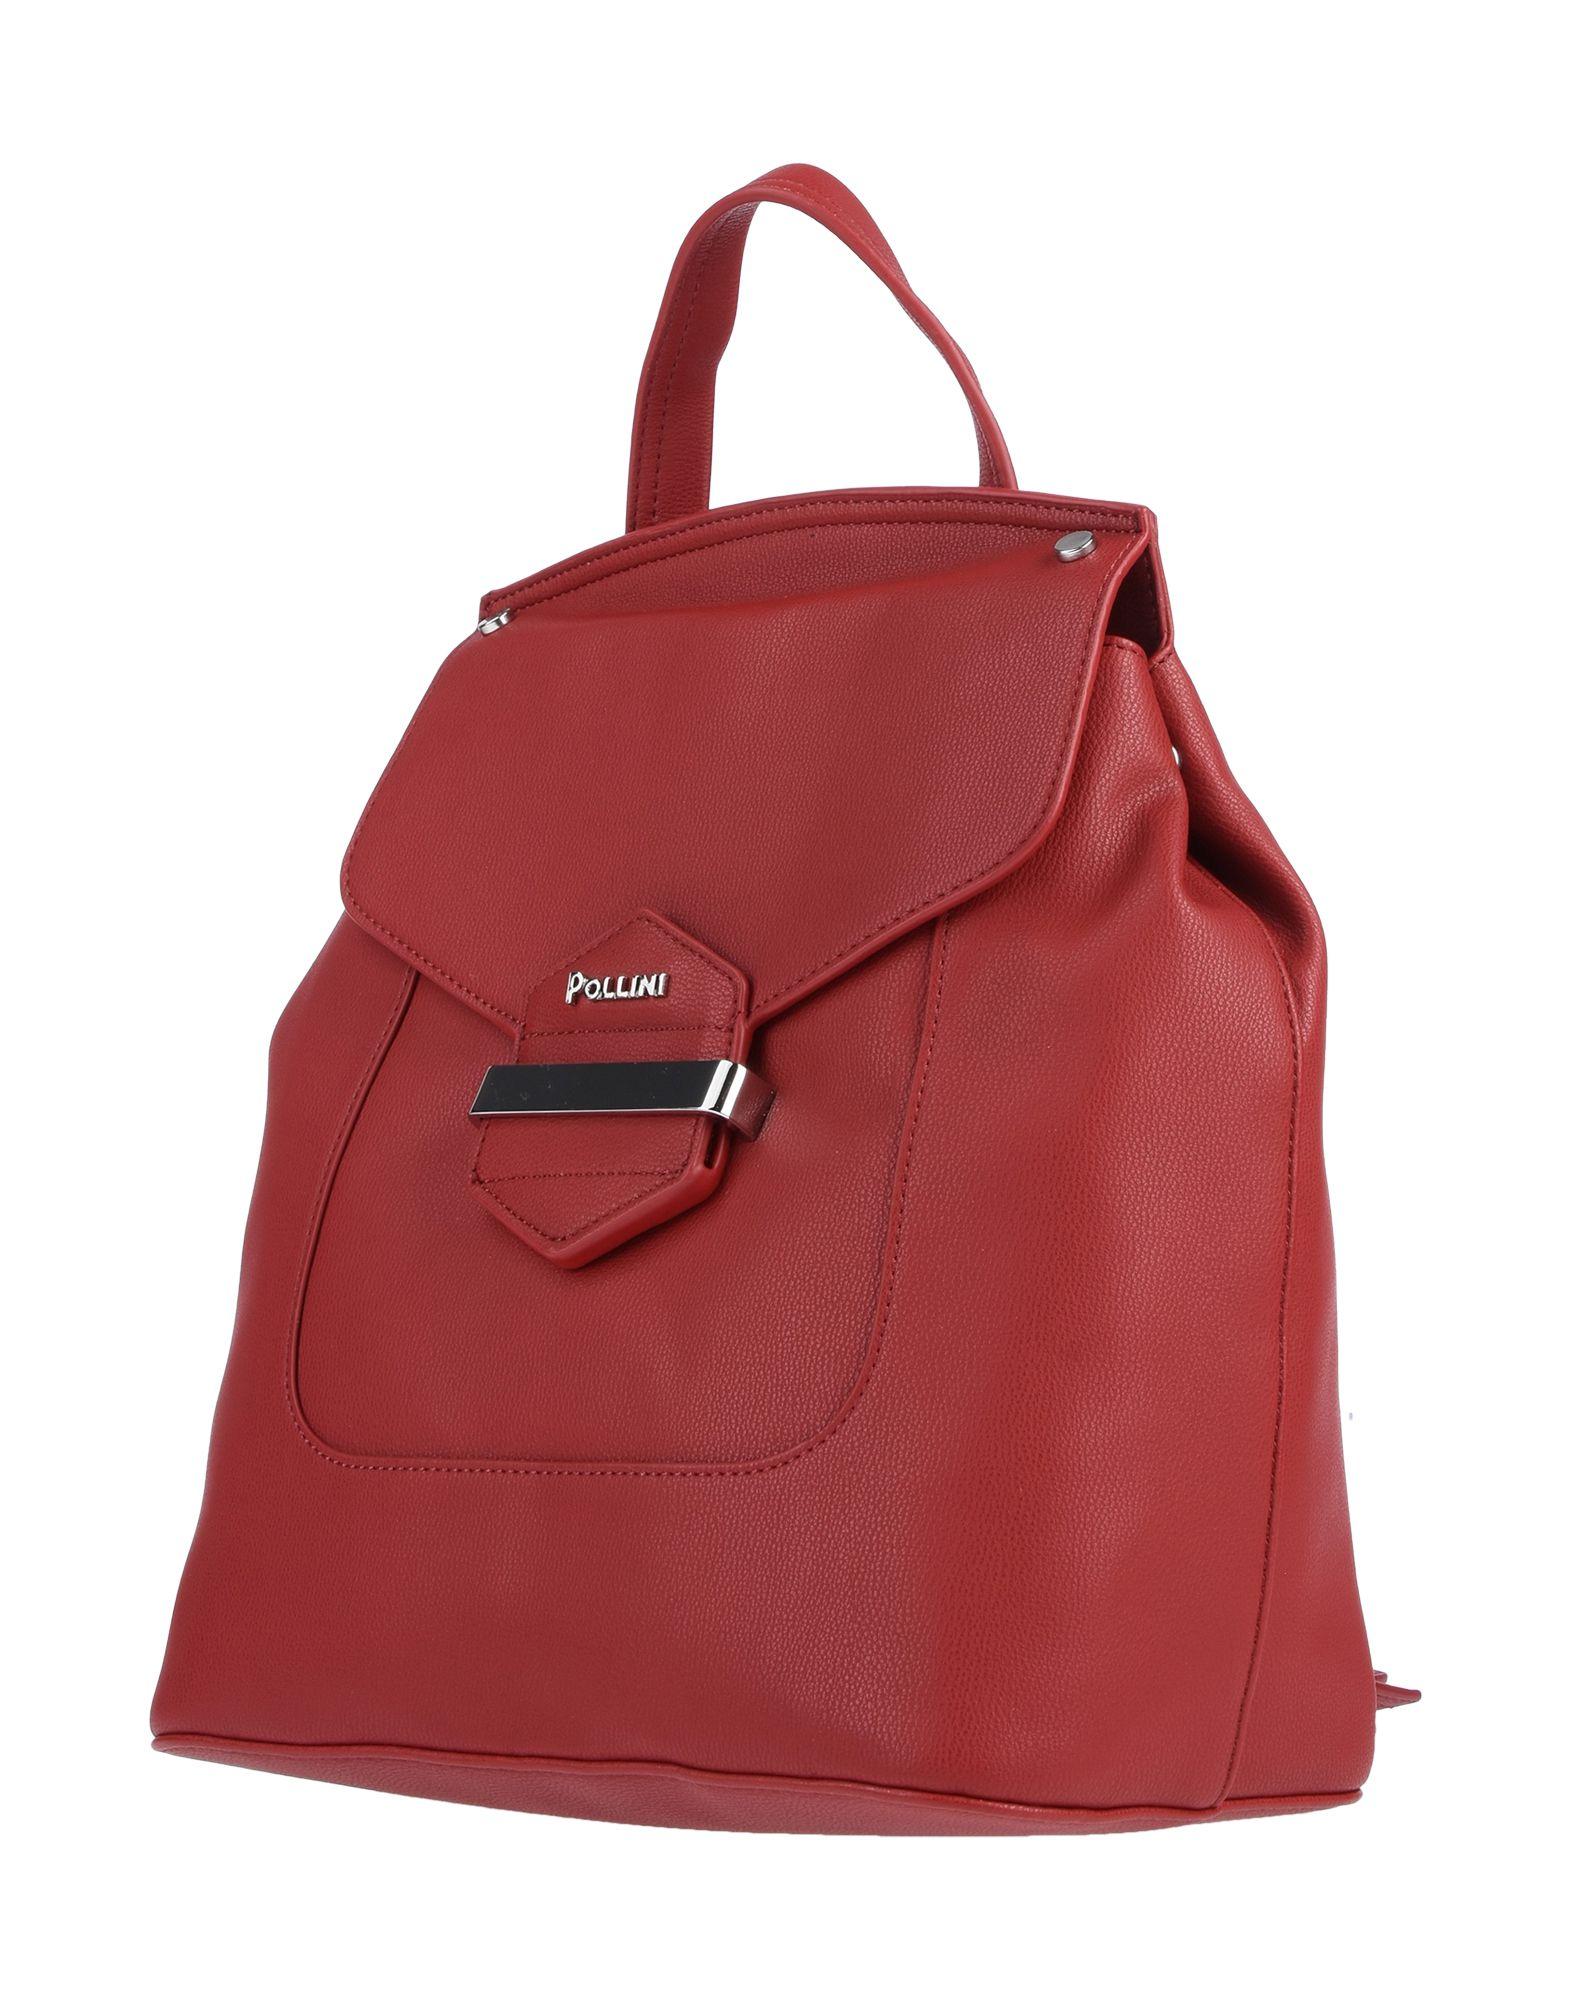 POLLINI Рюкзаки и сумки на пояс сумки magnolia сумка женская a761 7363 лак искусственная кожа page 8